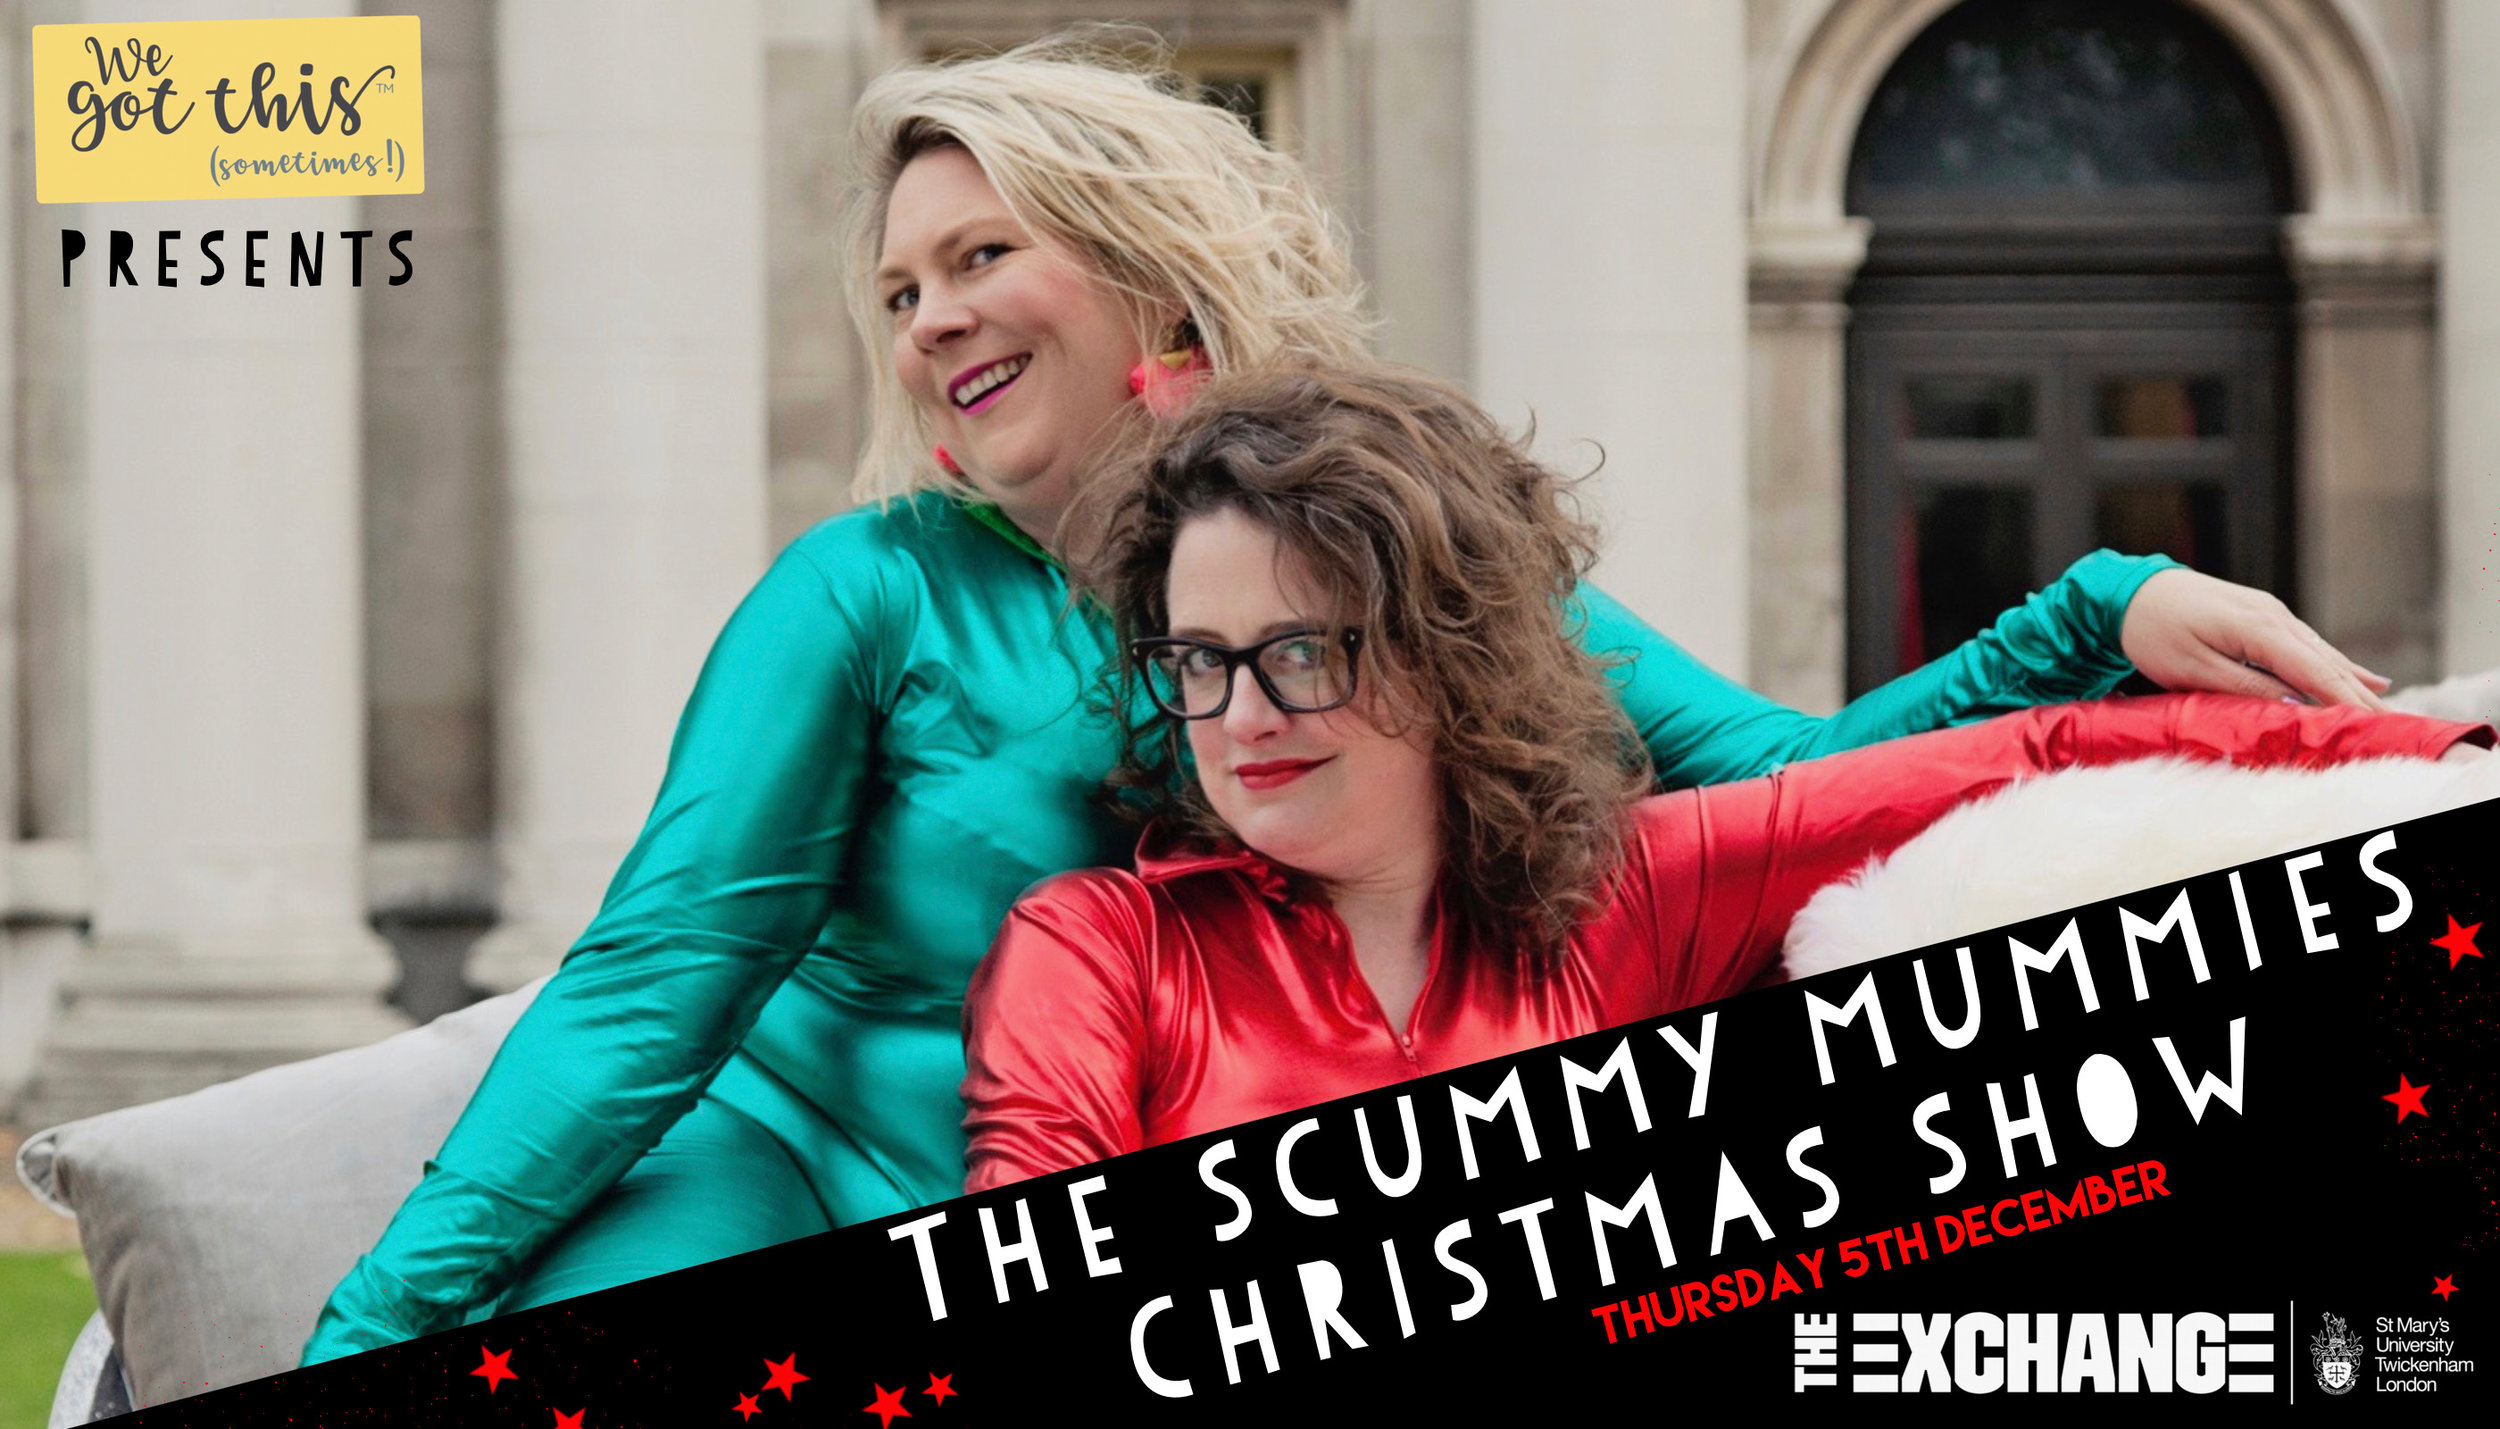 Twickenham Scummy Mummies Christmas Show We Got This